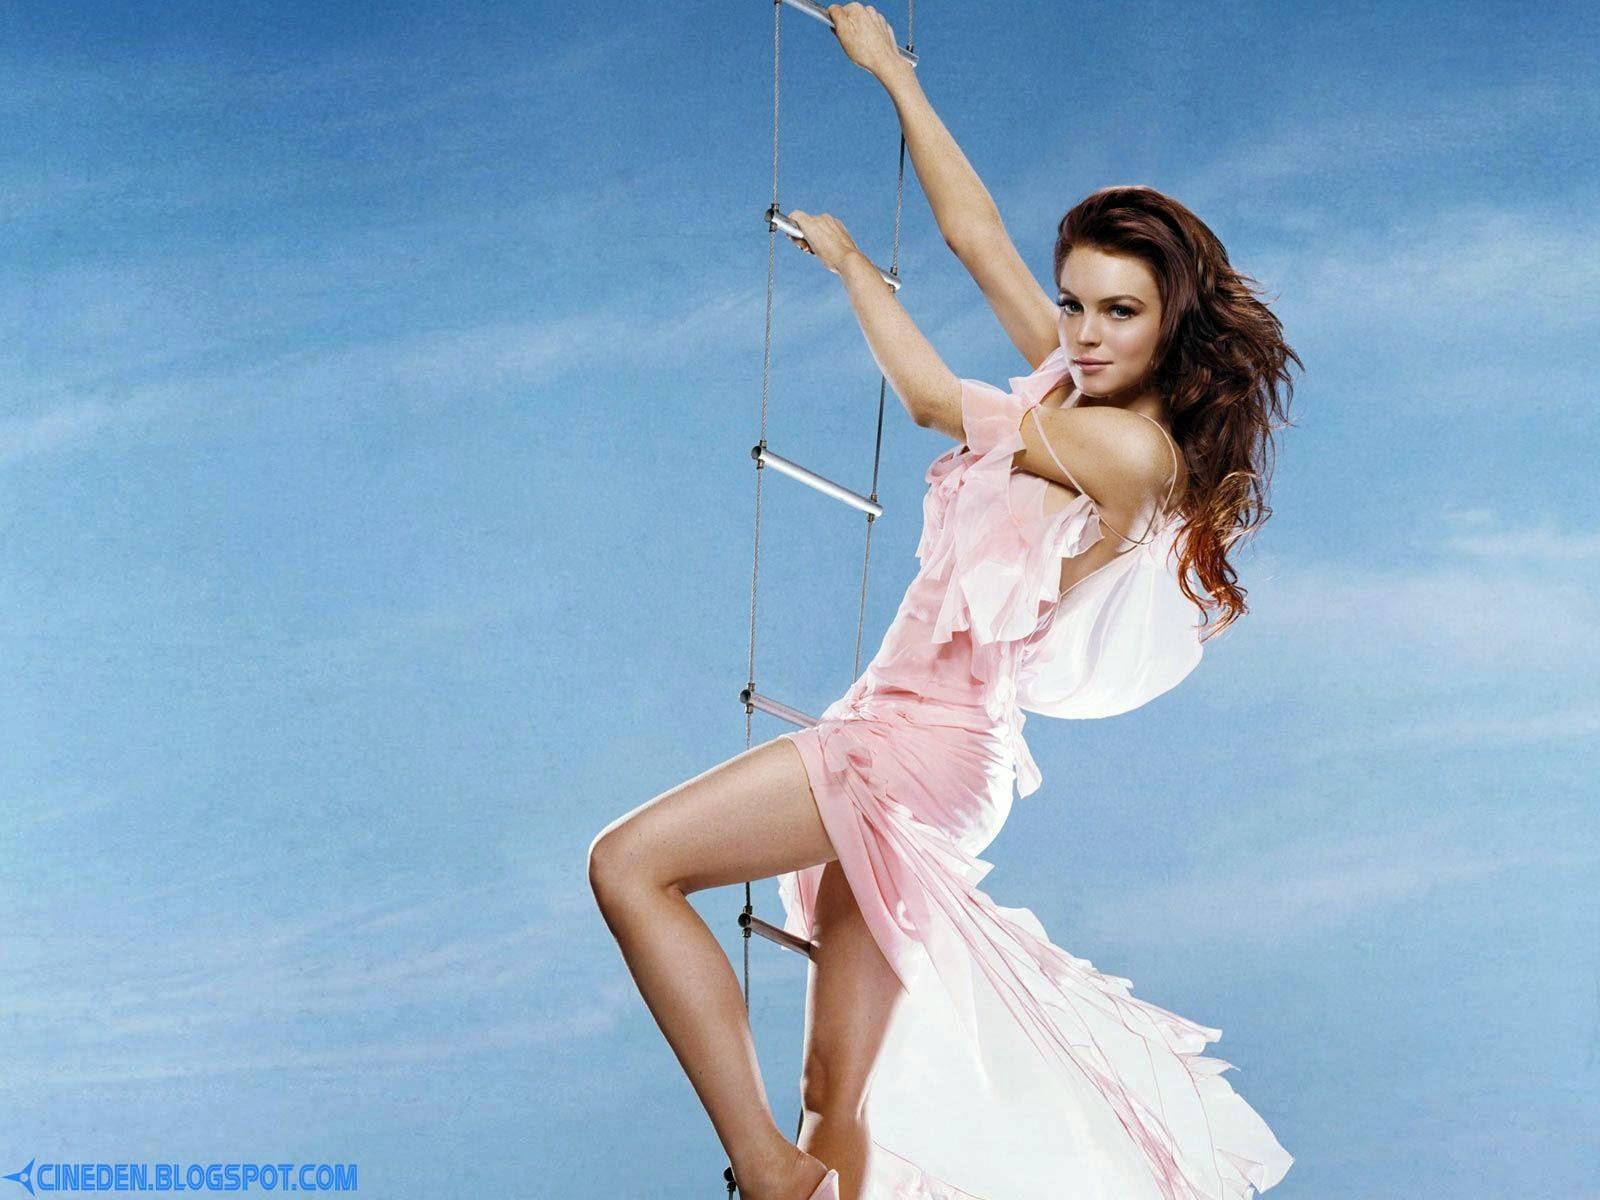 Lindsay Lohan ran naked in store - CineDen